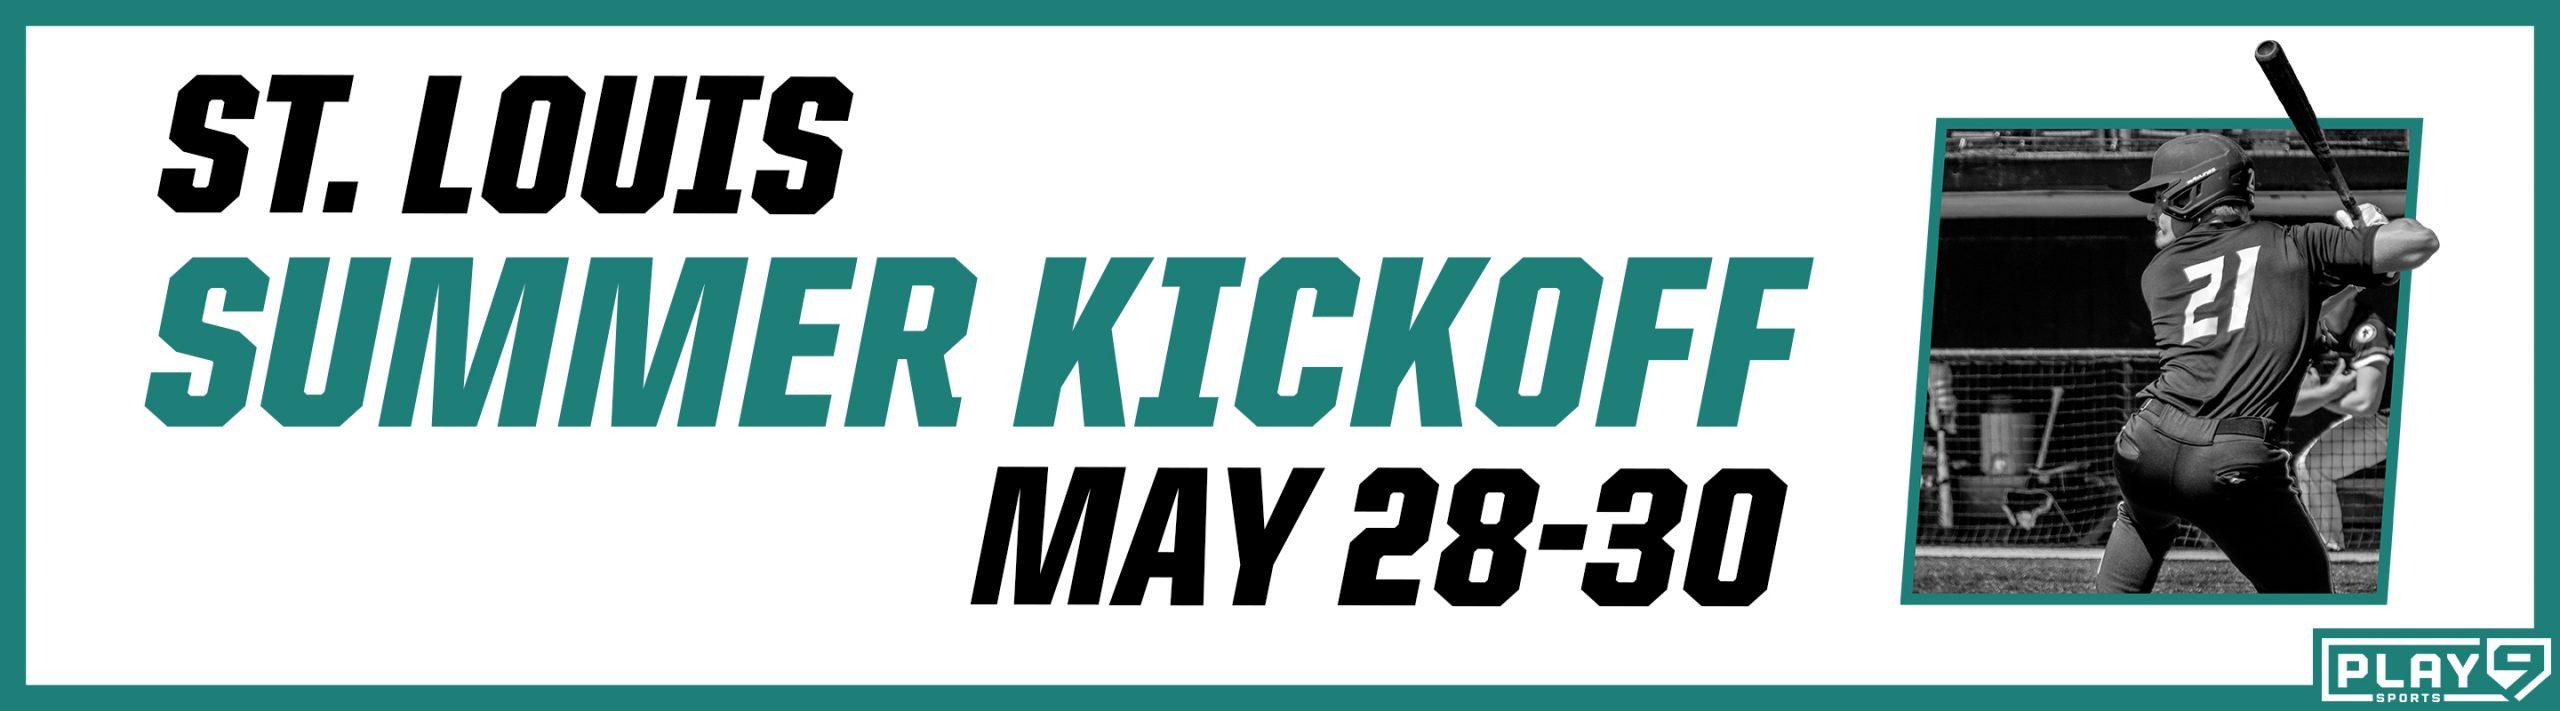 St. Louis Summer Kickoff